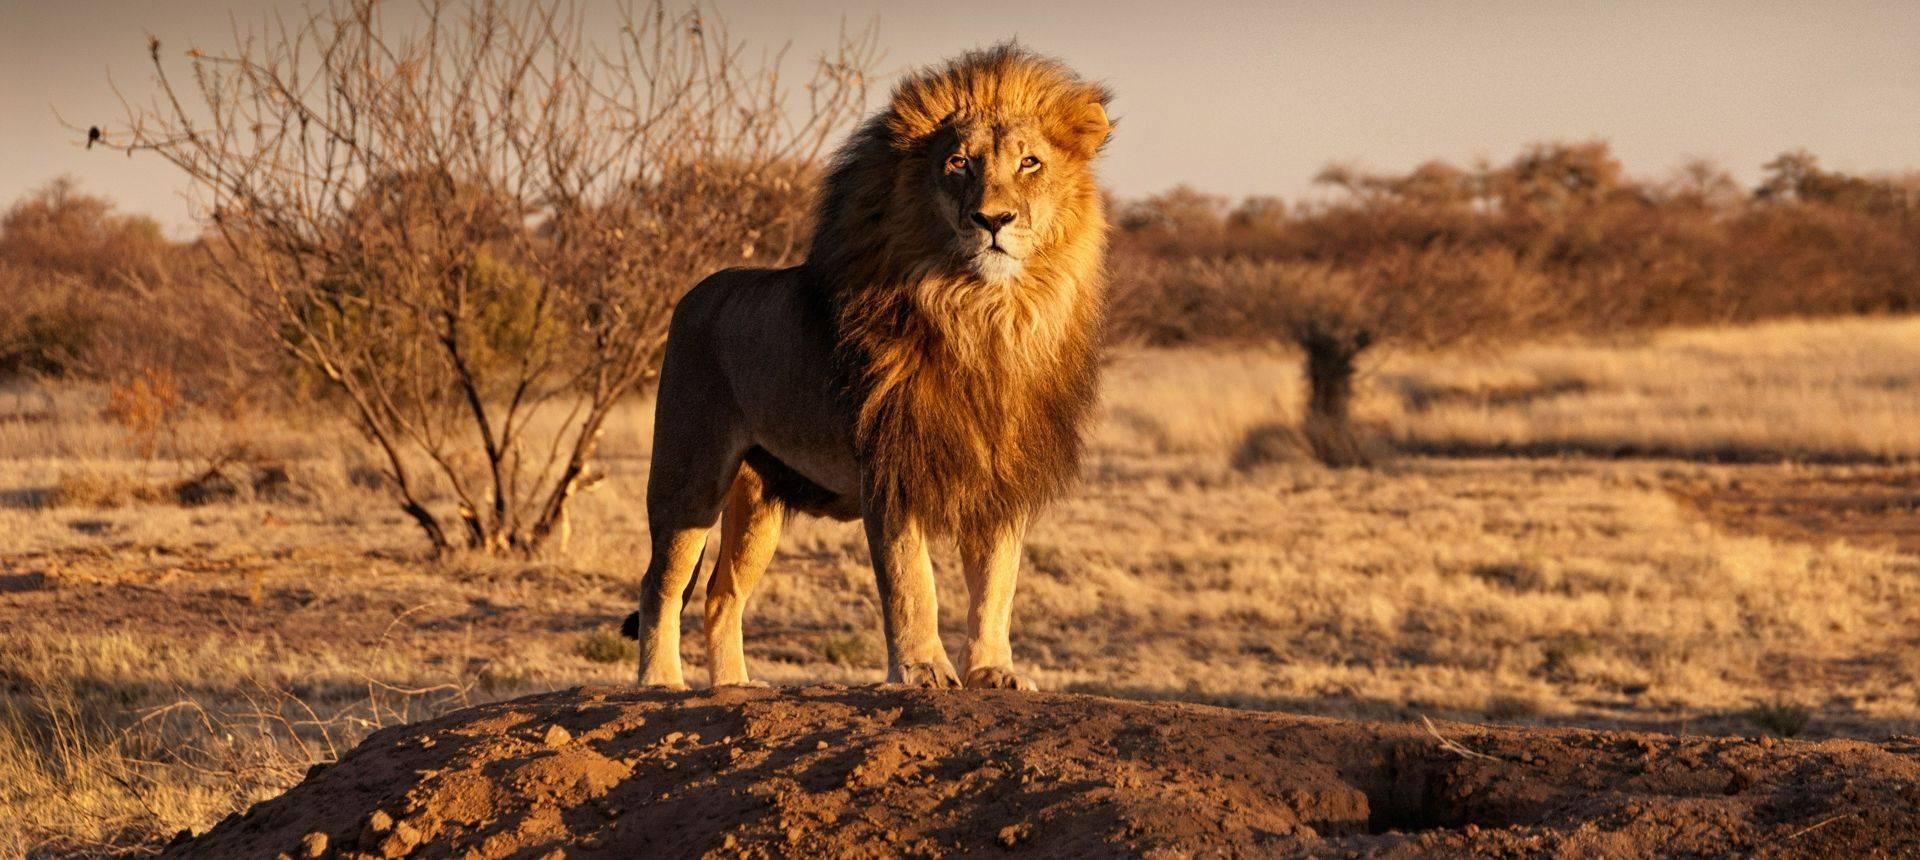 Photography Tours  Lion, Kalahari, Botswana Shutterstock 547175677